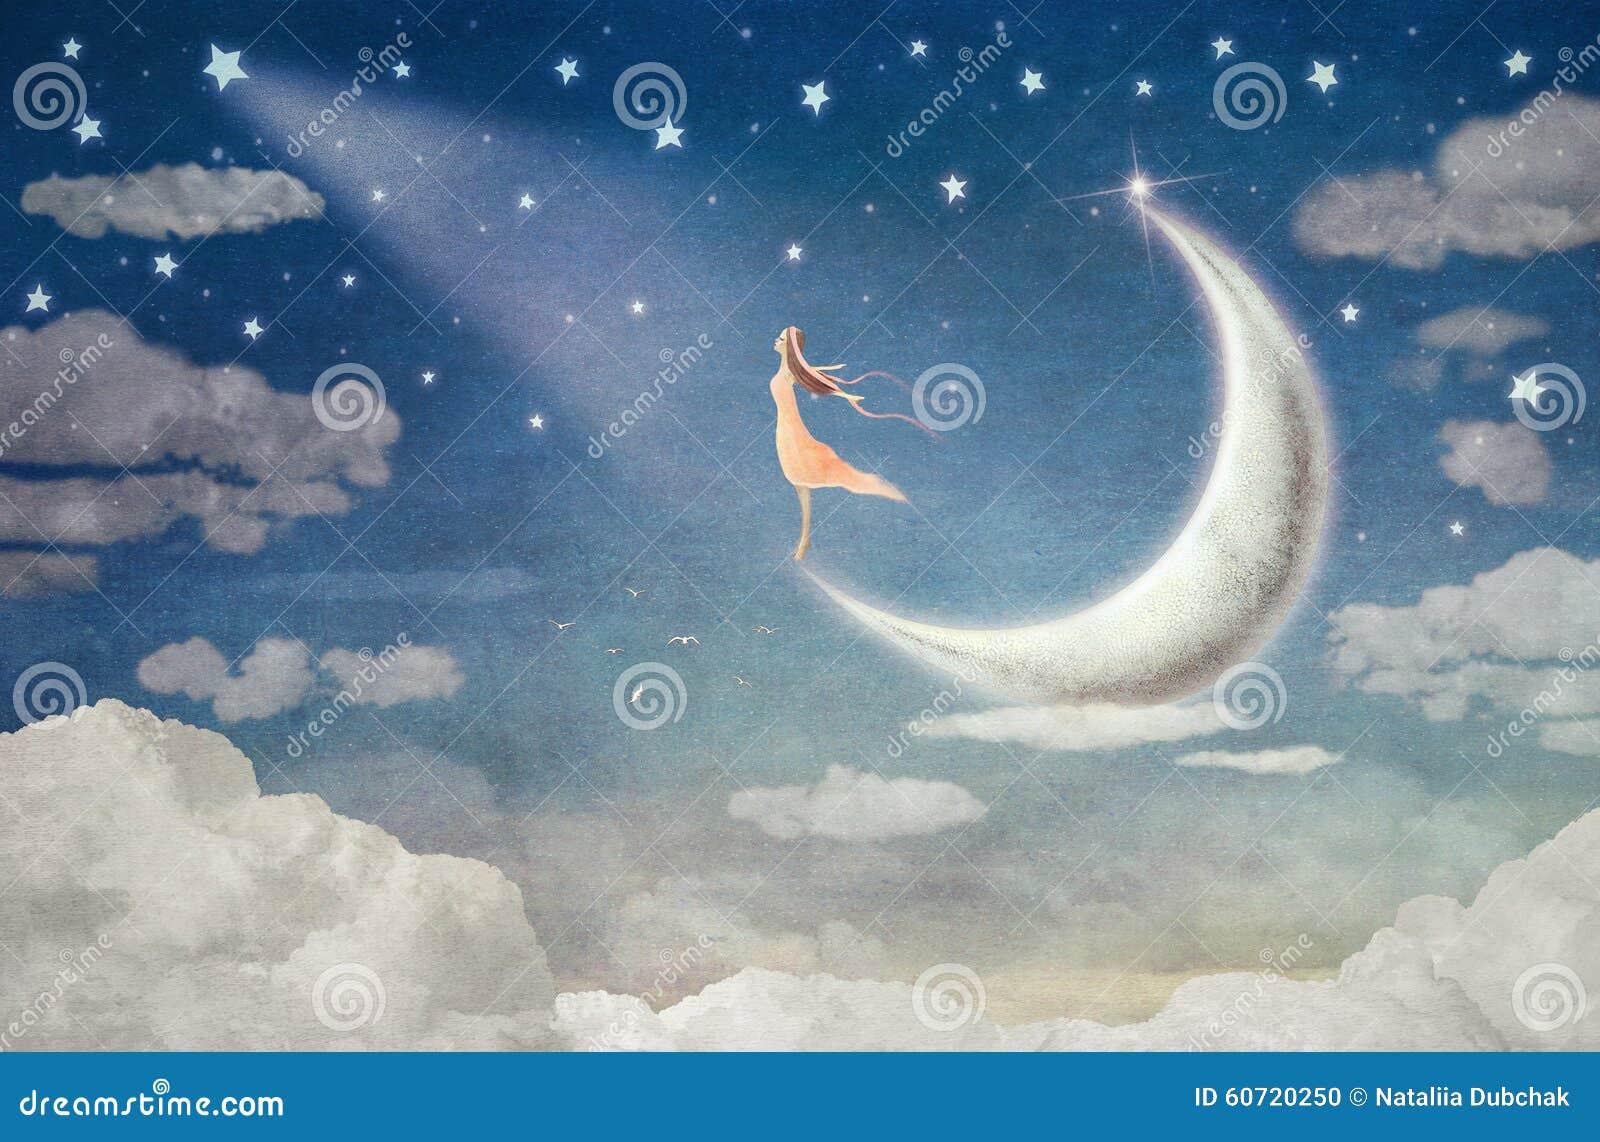 Девушка на луне восхищает ночное небо